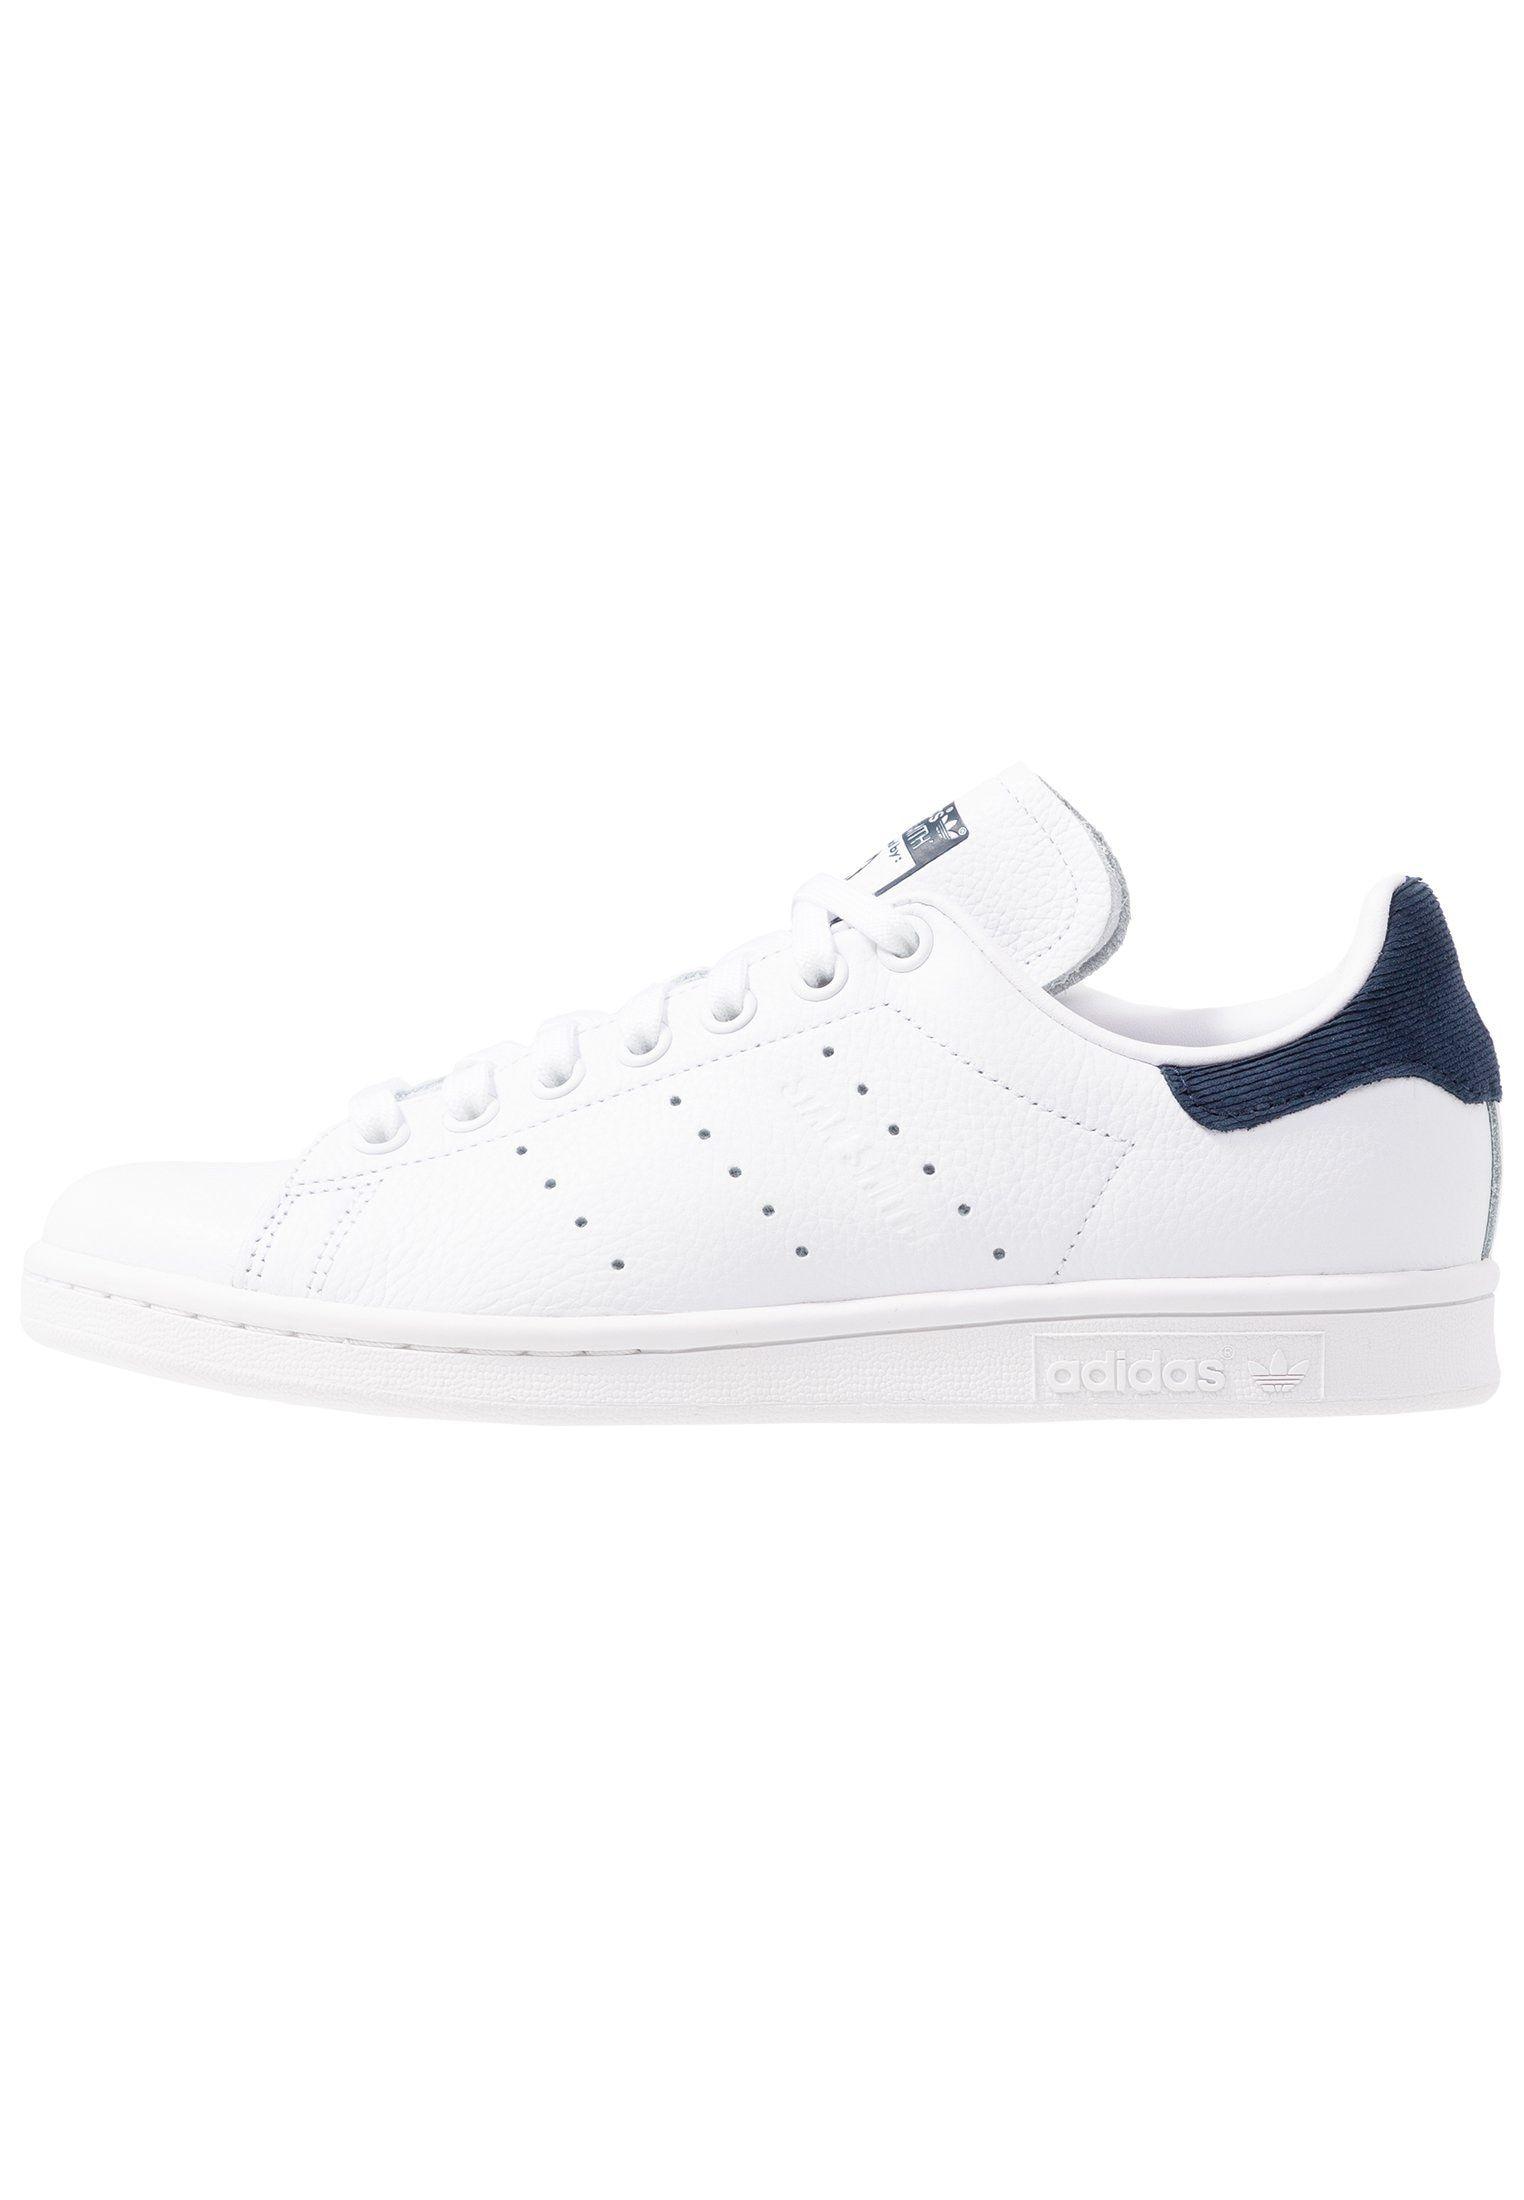 STAN SMITH Baskets basses footwear whitecollegiate navy